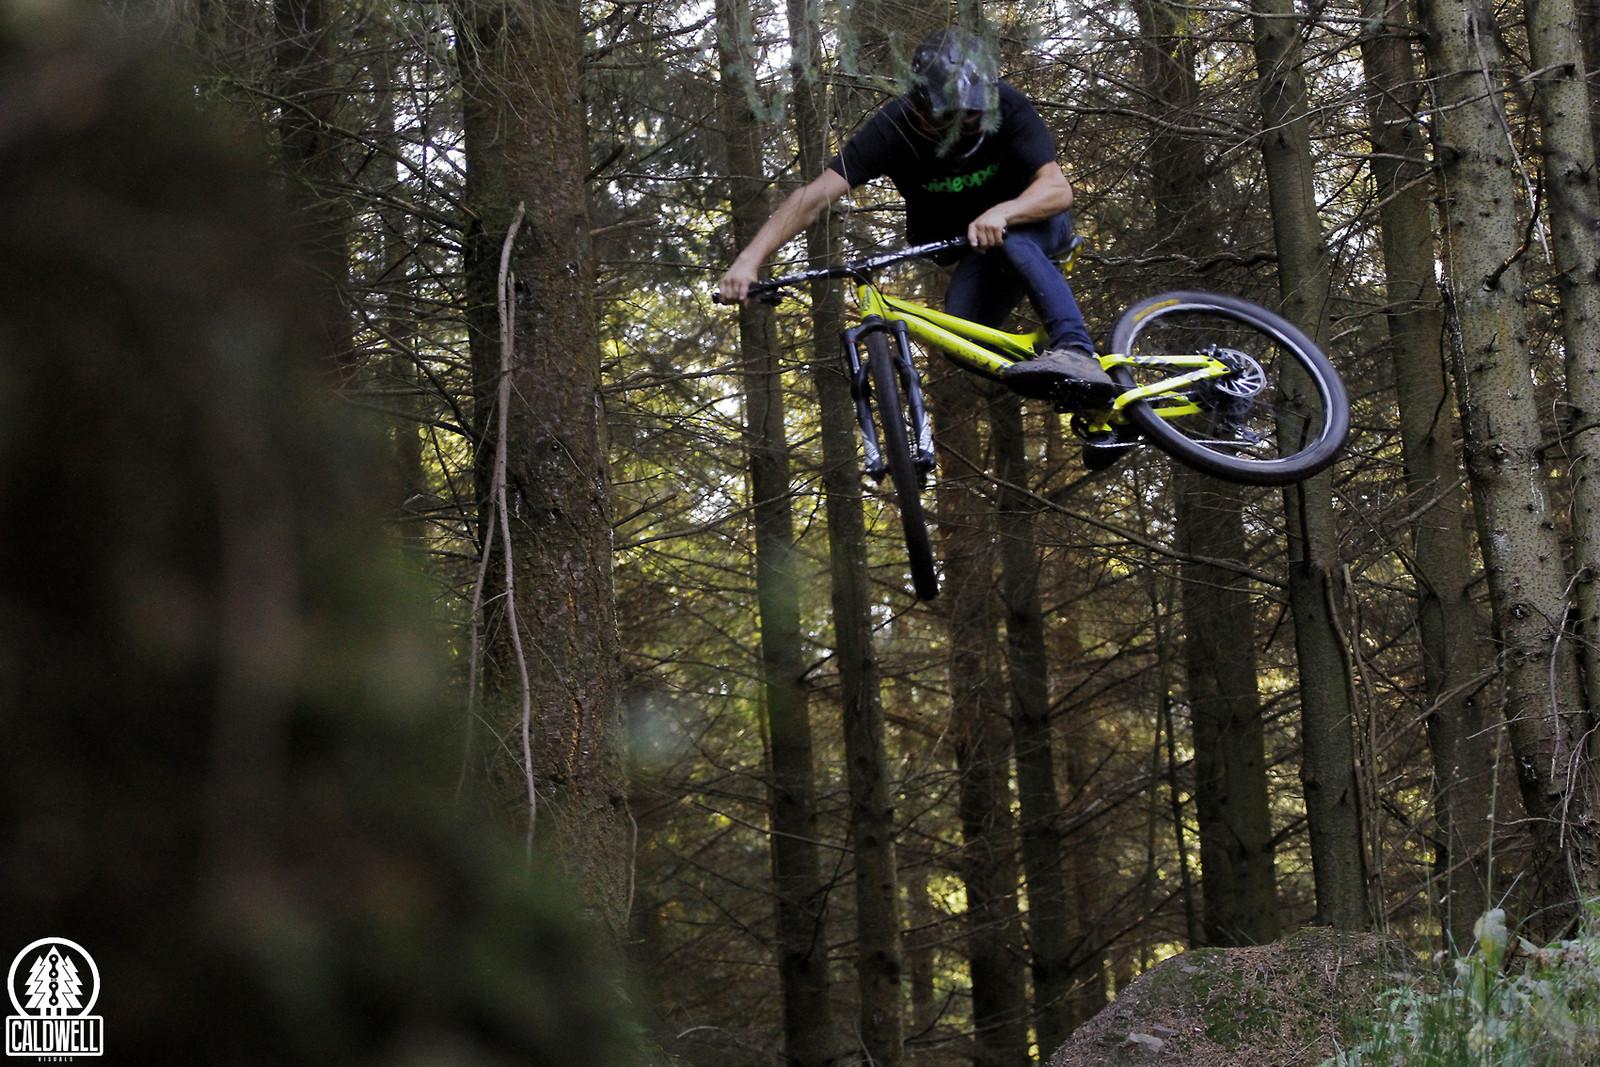 Sideways is forwards - CaldwellVisuals - Mountain Biking Pictures - Vital MTB